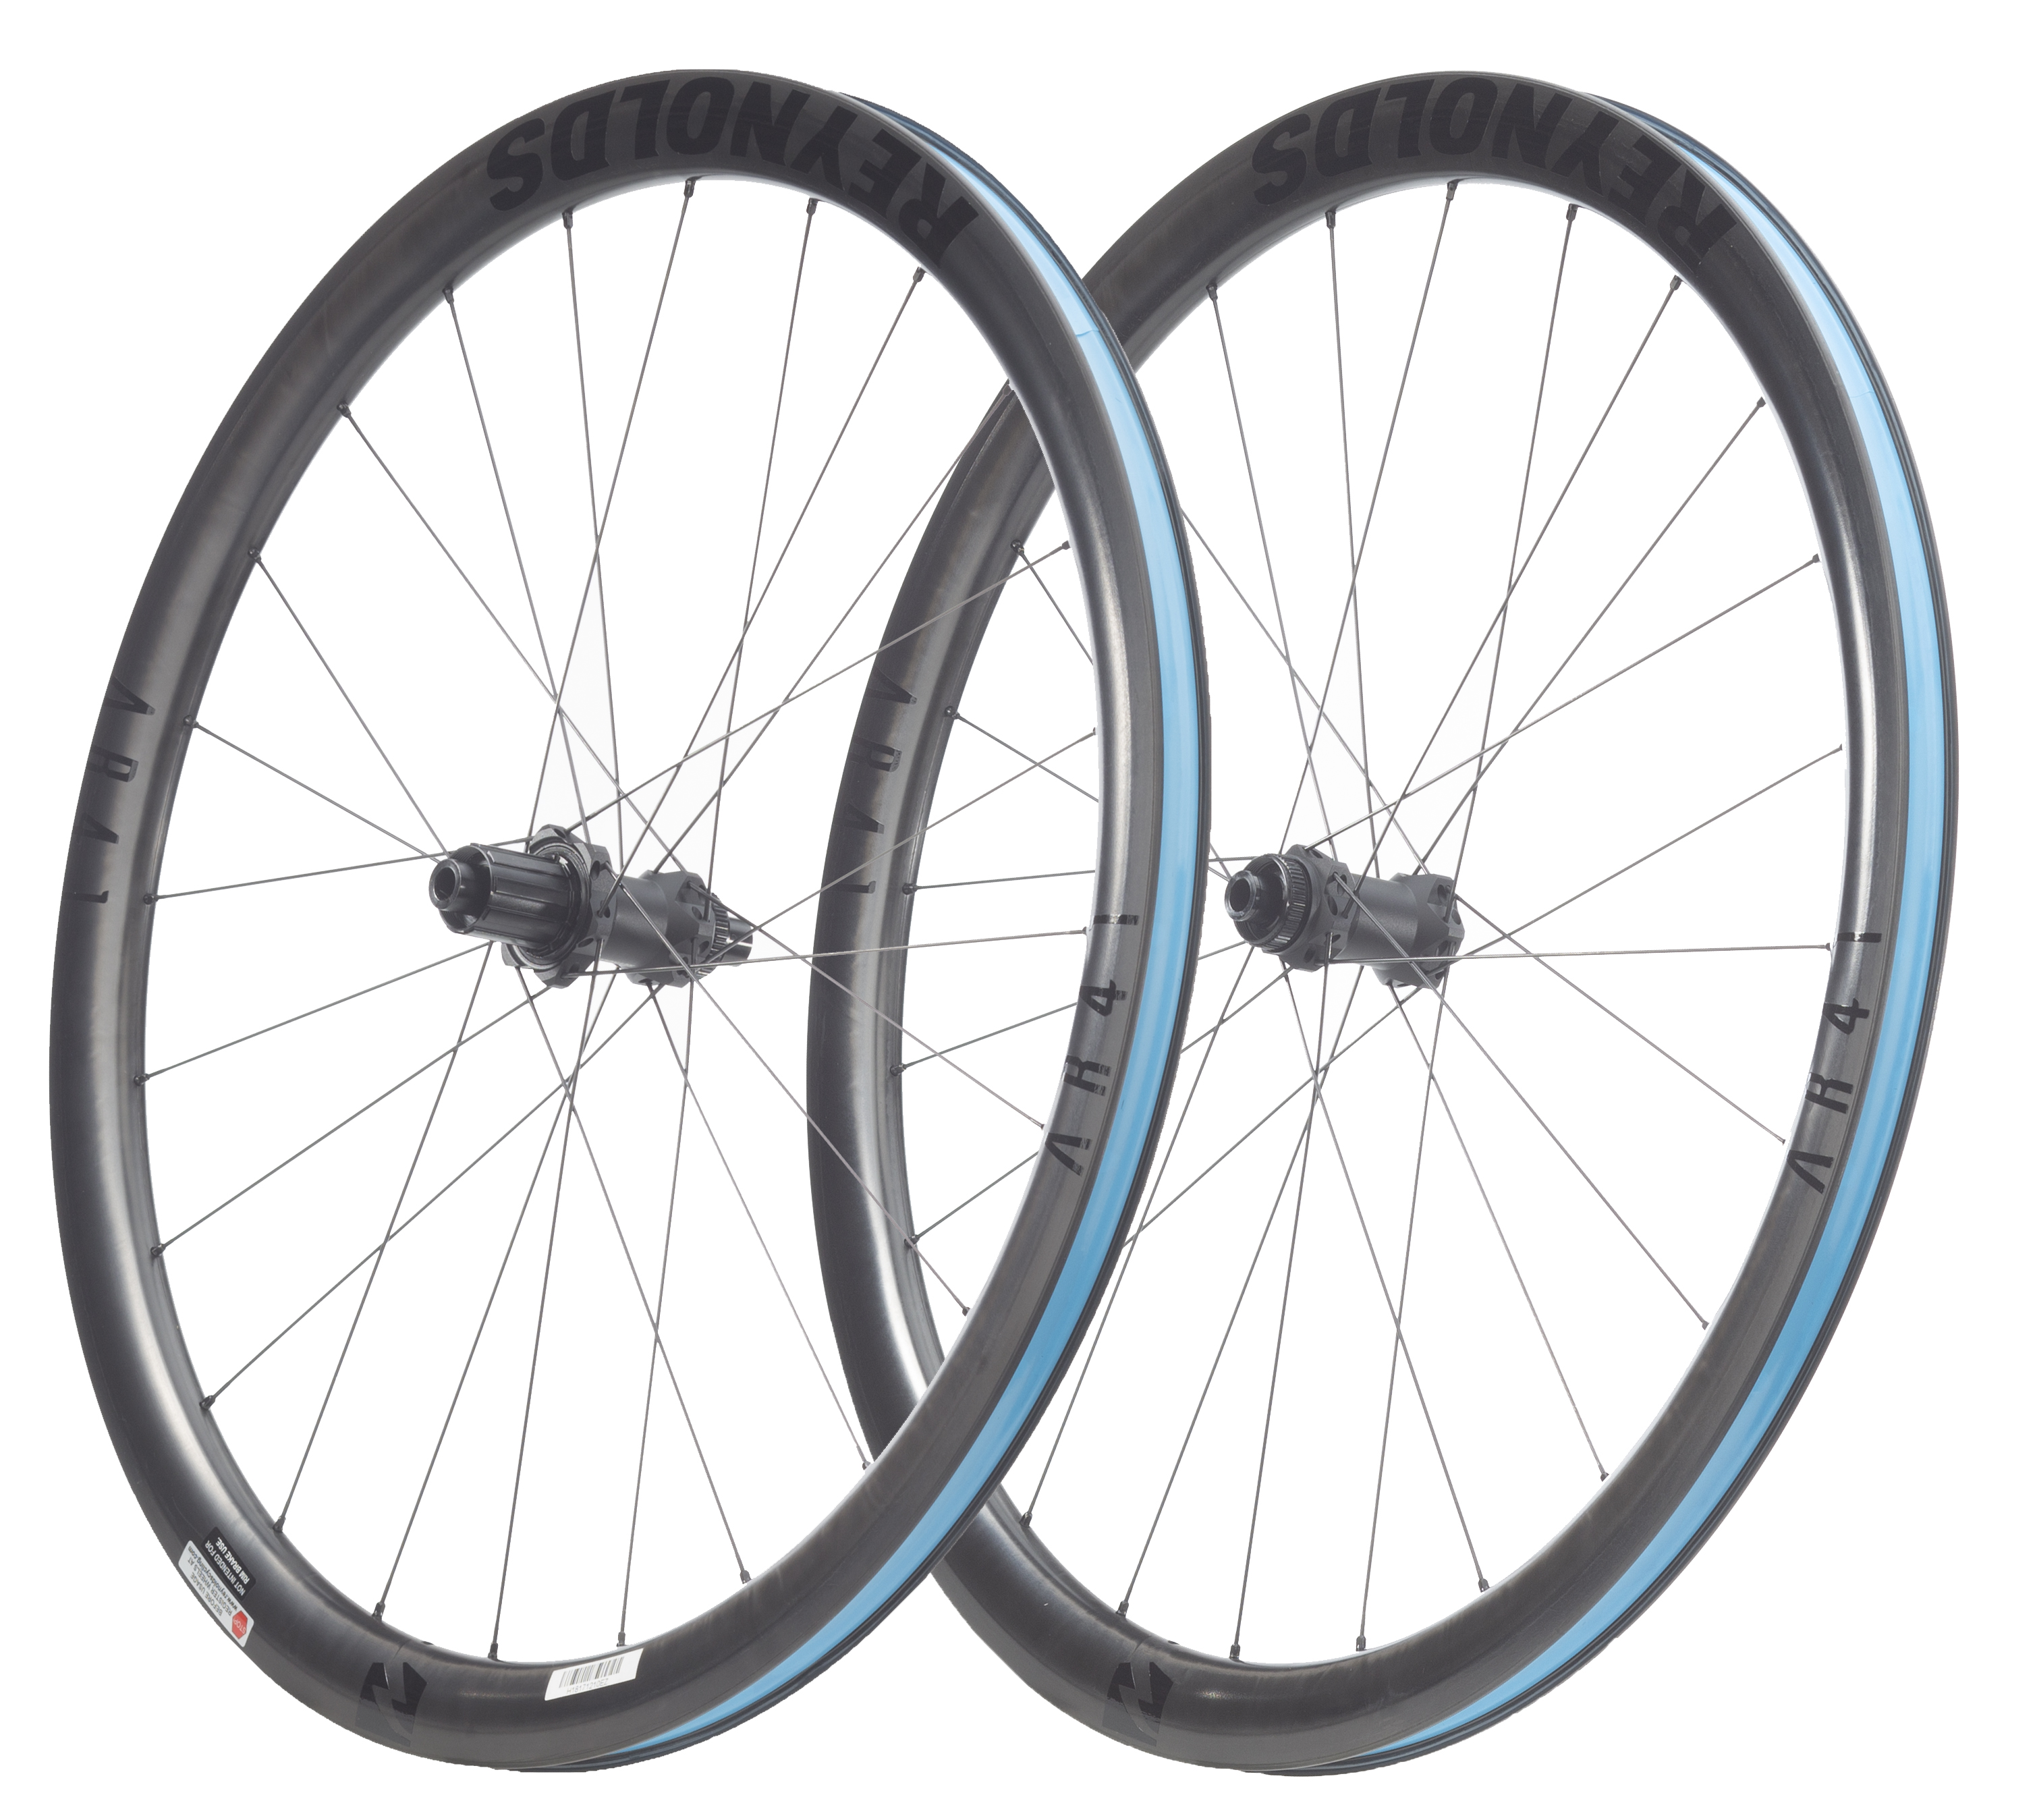 700c Disc Wheelset >> Reynolds Ar41 Disc Wheelset